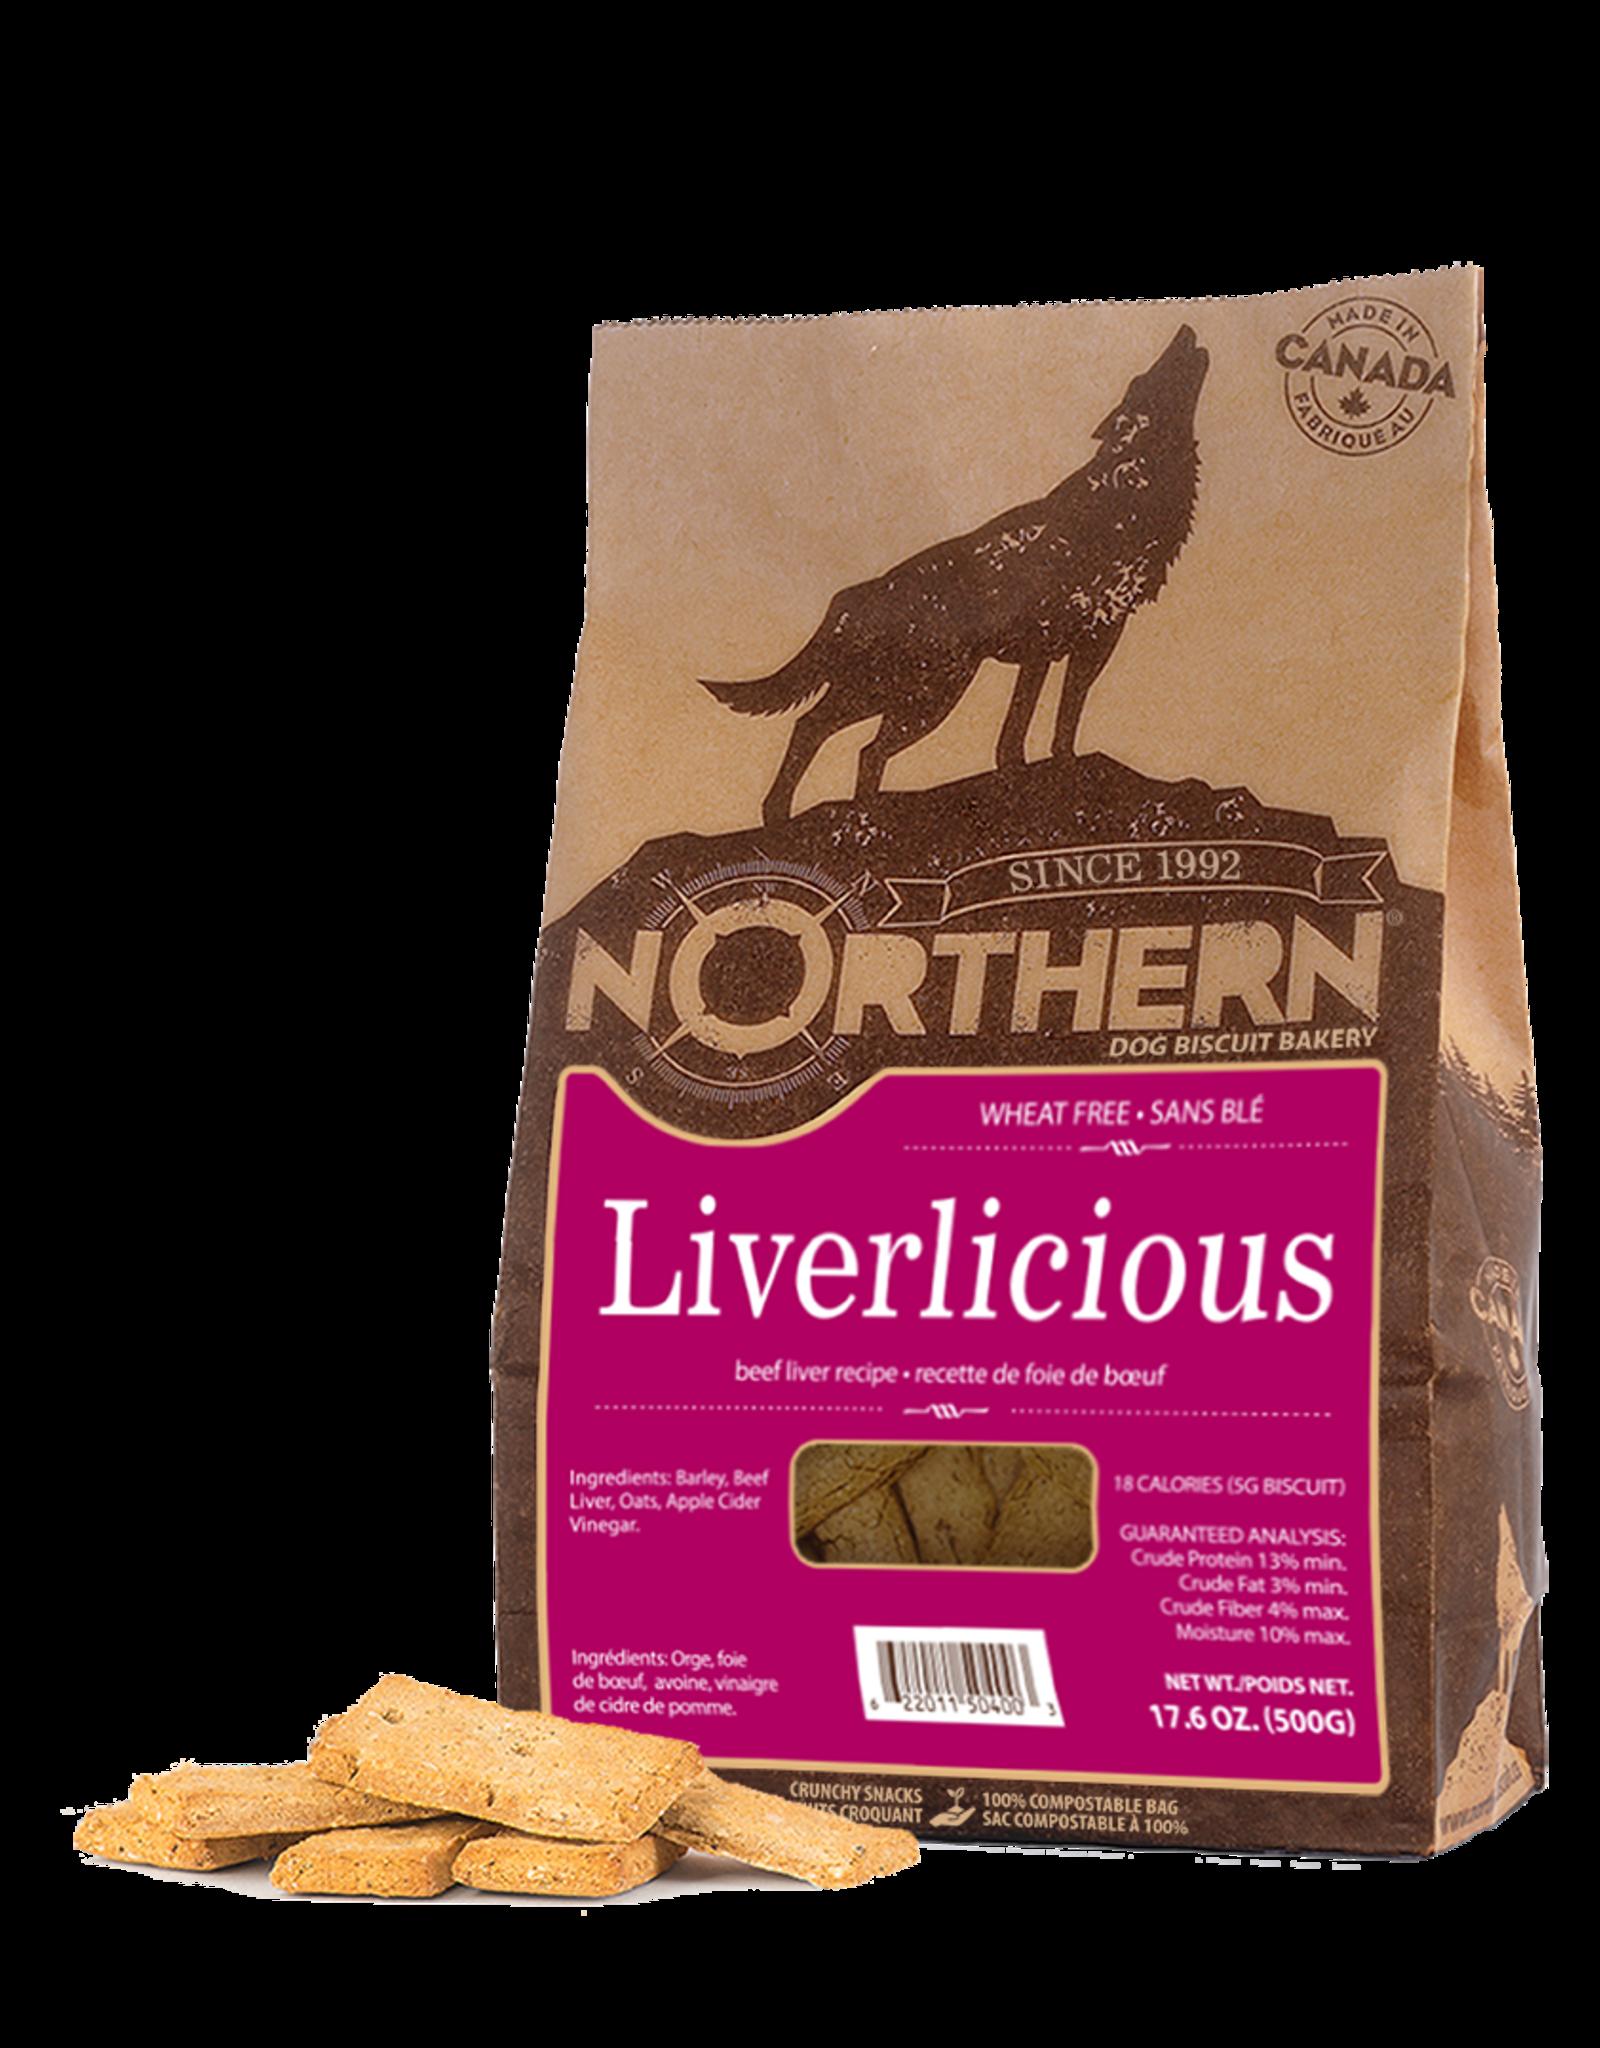 Northern Biscuits Northern Biscuit Liverlicious 500g